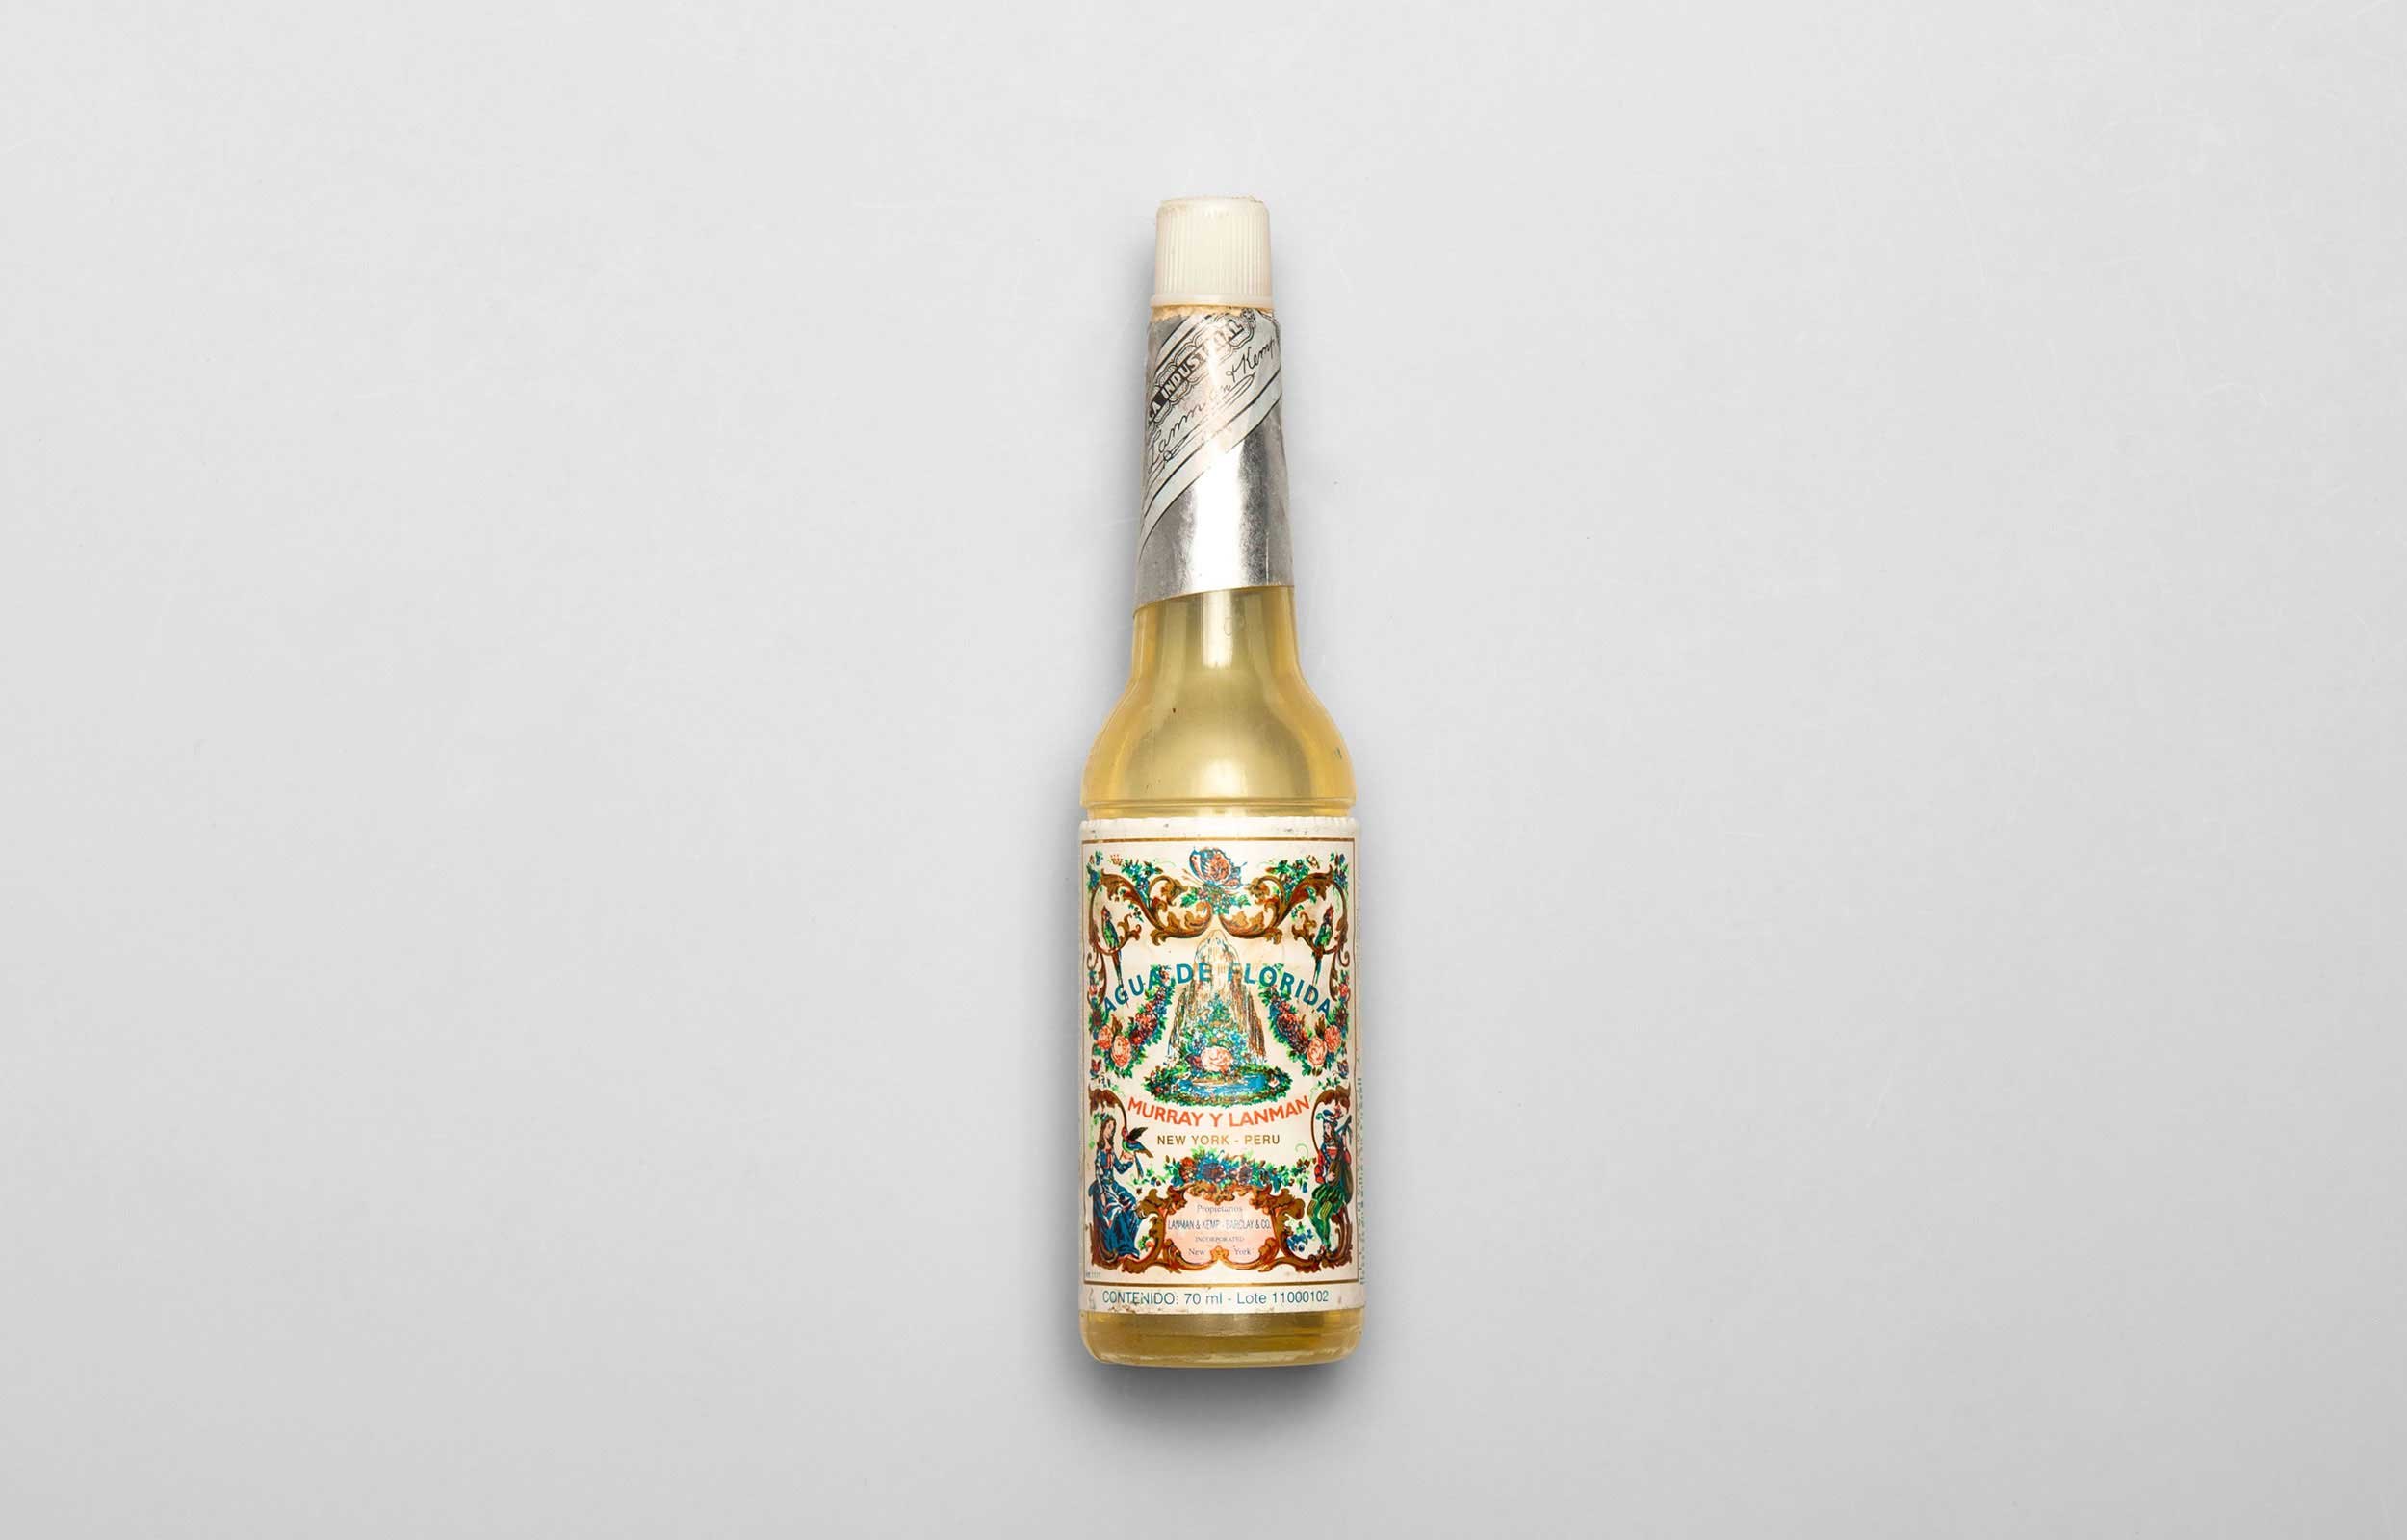 Carl von Siemens Aqua de Florida Flasche